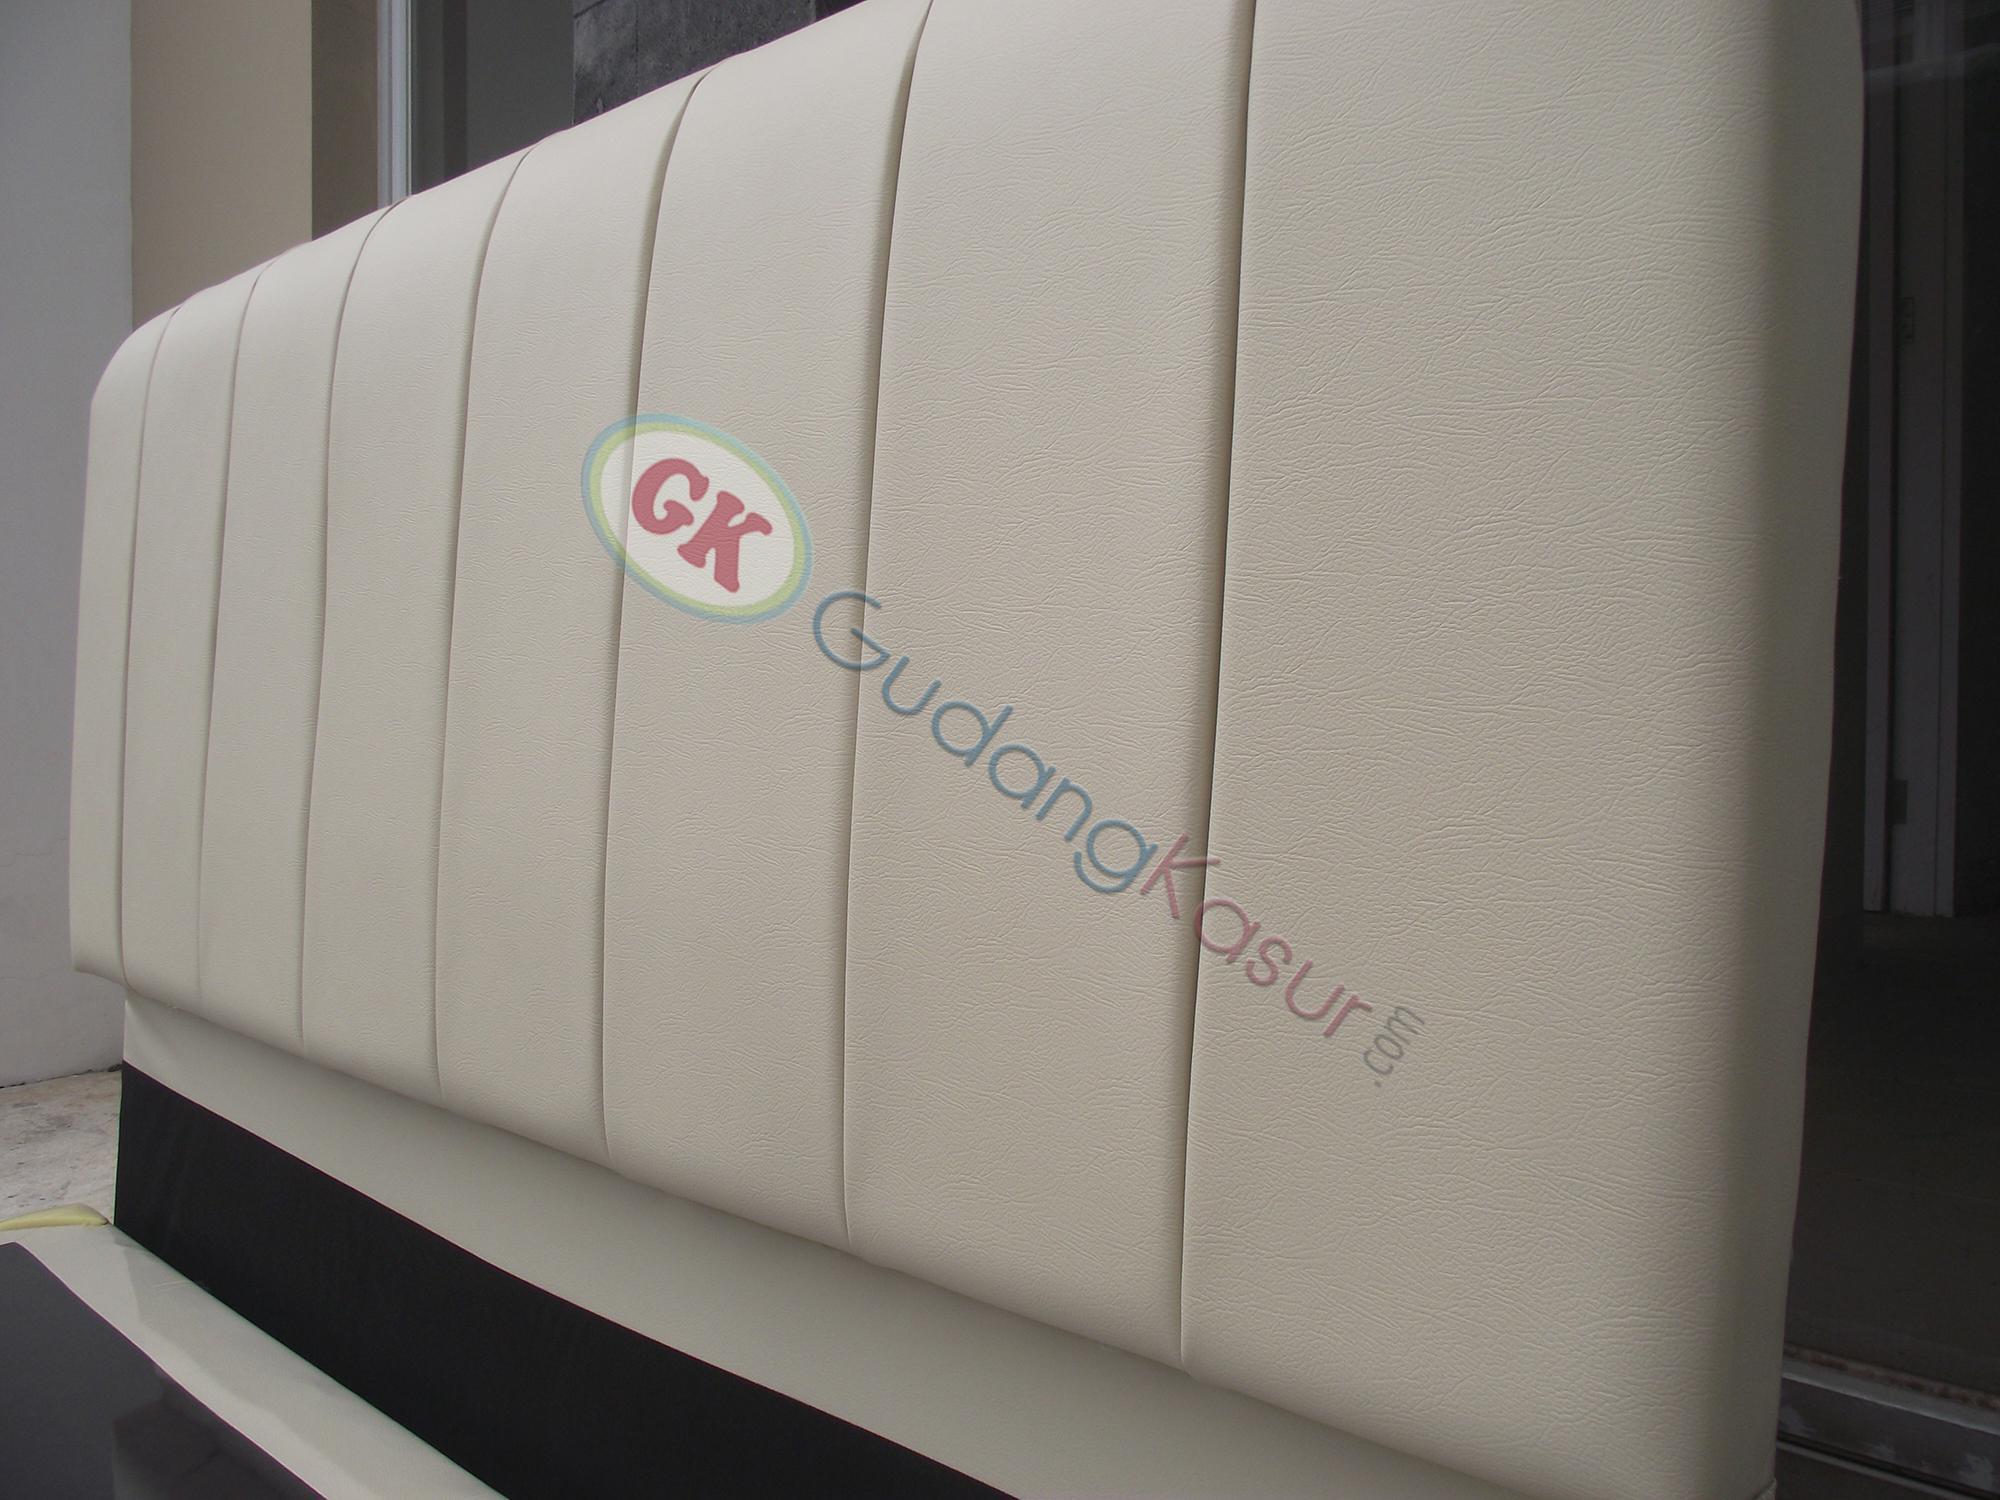 Cek Harga Baru Set Divan Sandaran Type Basic Ukuran Queen Size Sky Dipan Headboard Kasur Dan Springbed 160x200